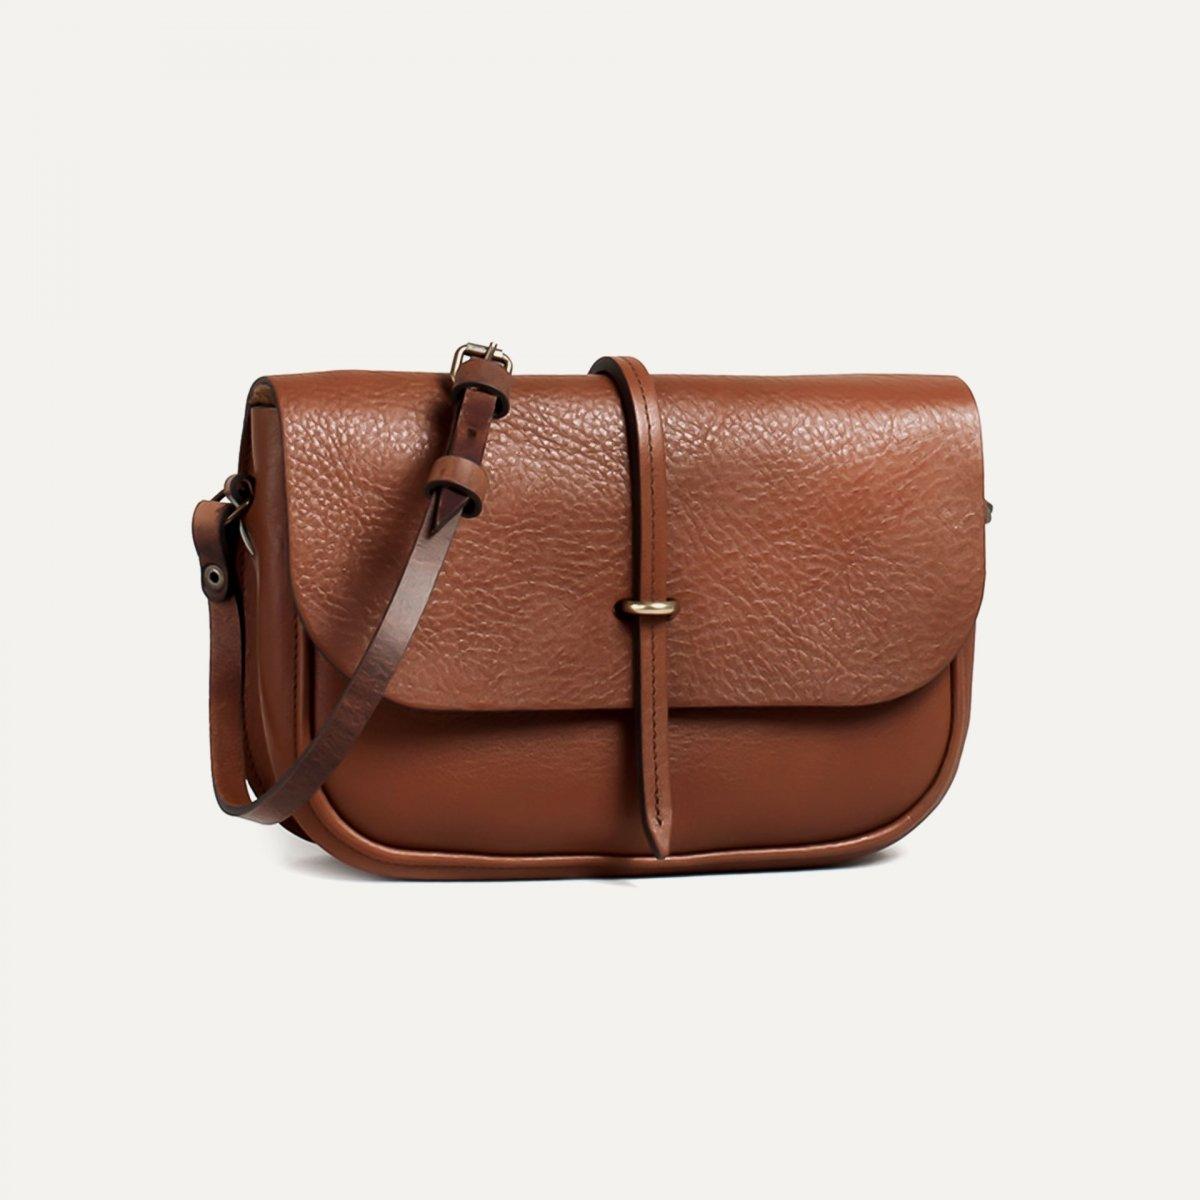 Pastis handbag - Cuba Libre (image n°2)